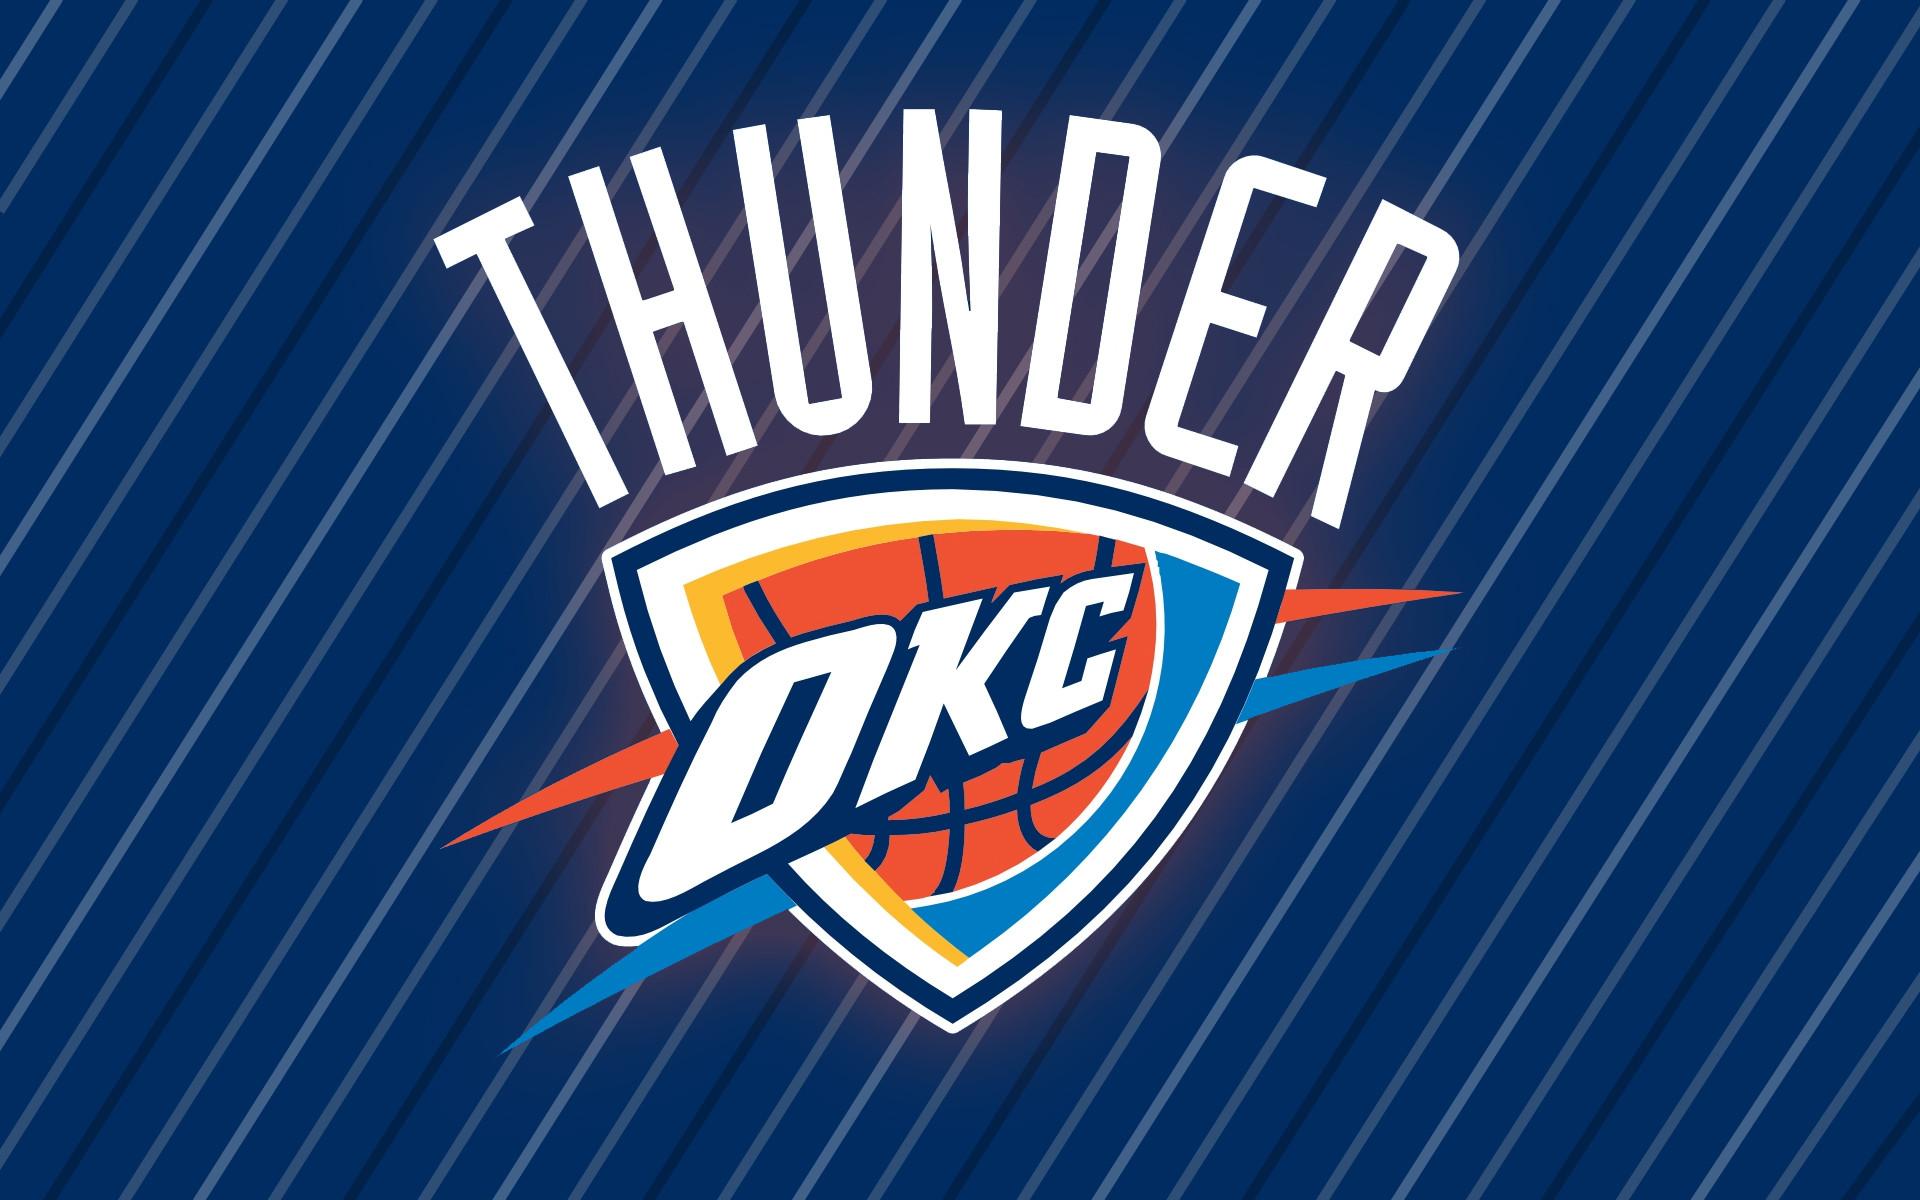 Lovely Oklahoma City Thunder Wallpapers All For You Wallpaper Site  1680×1050 Oklahoma Thunder Wallpapers (35 Wallpapers) | Adorable Wallpapers  | Pinterest …